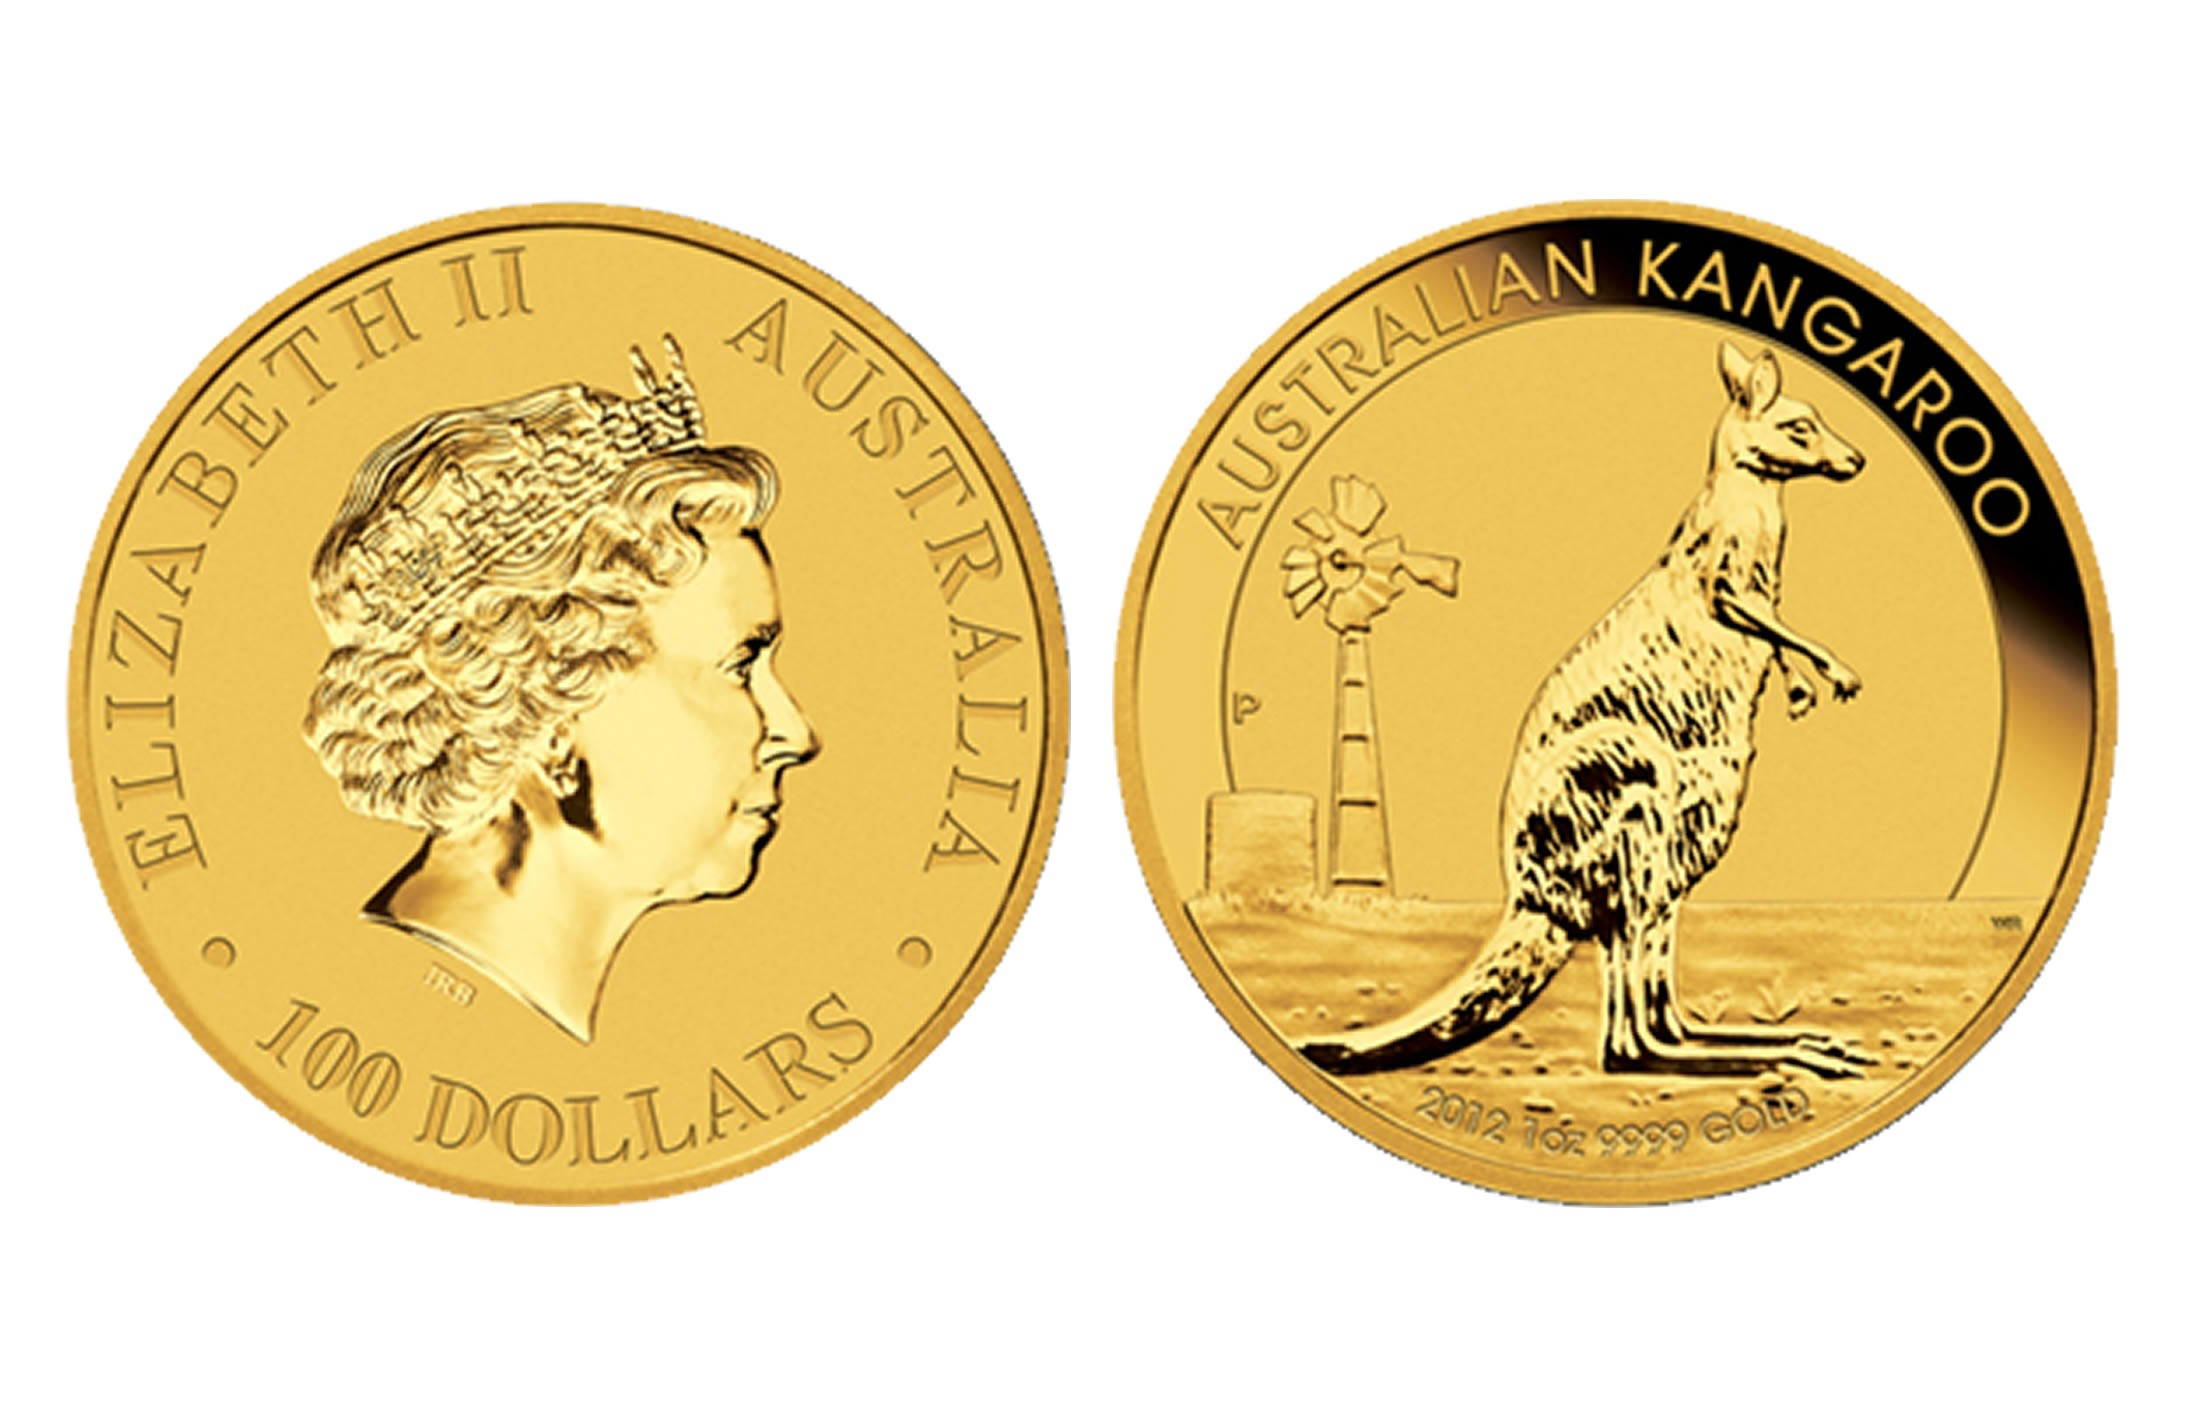 Australian Gold Kangaroo 1 Oz 2012 Amp Prior 100